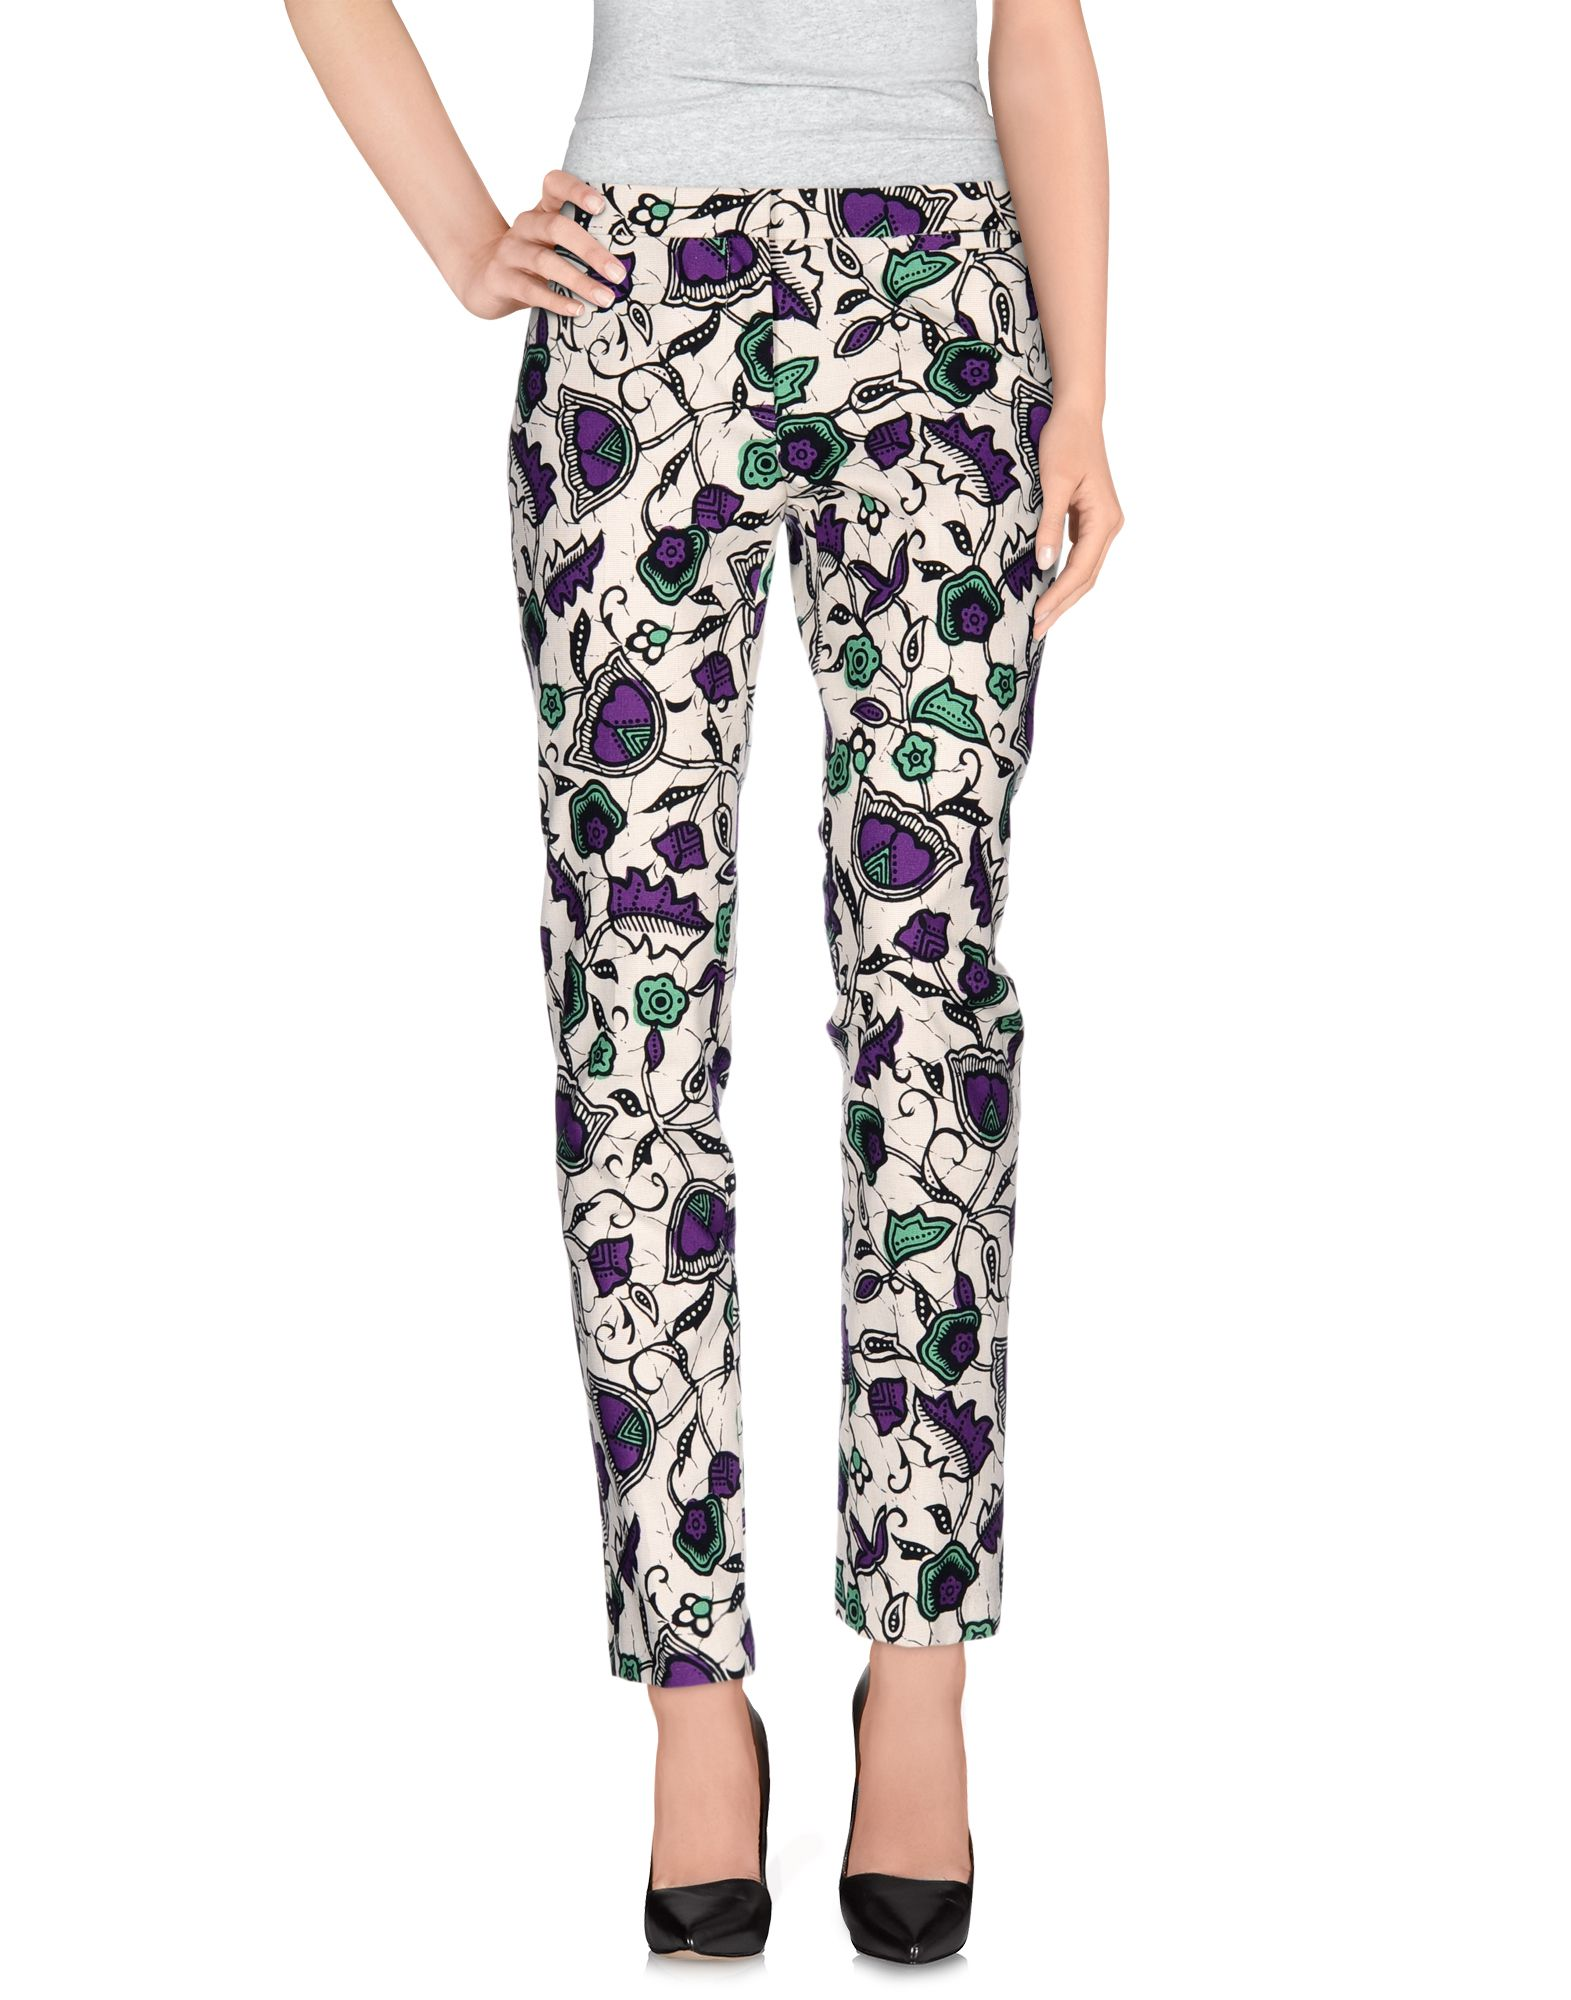 Pantalone Incotex Donna - Acquista online su QRD6CraU